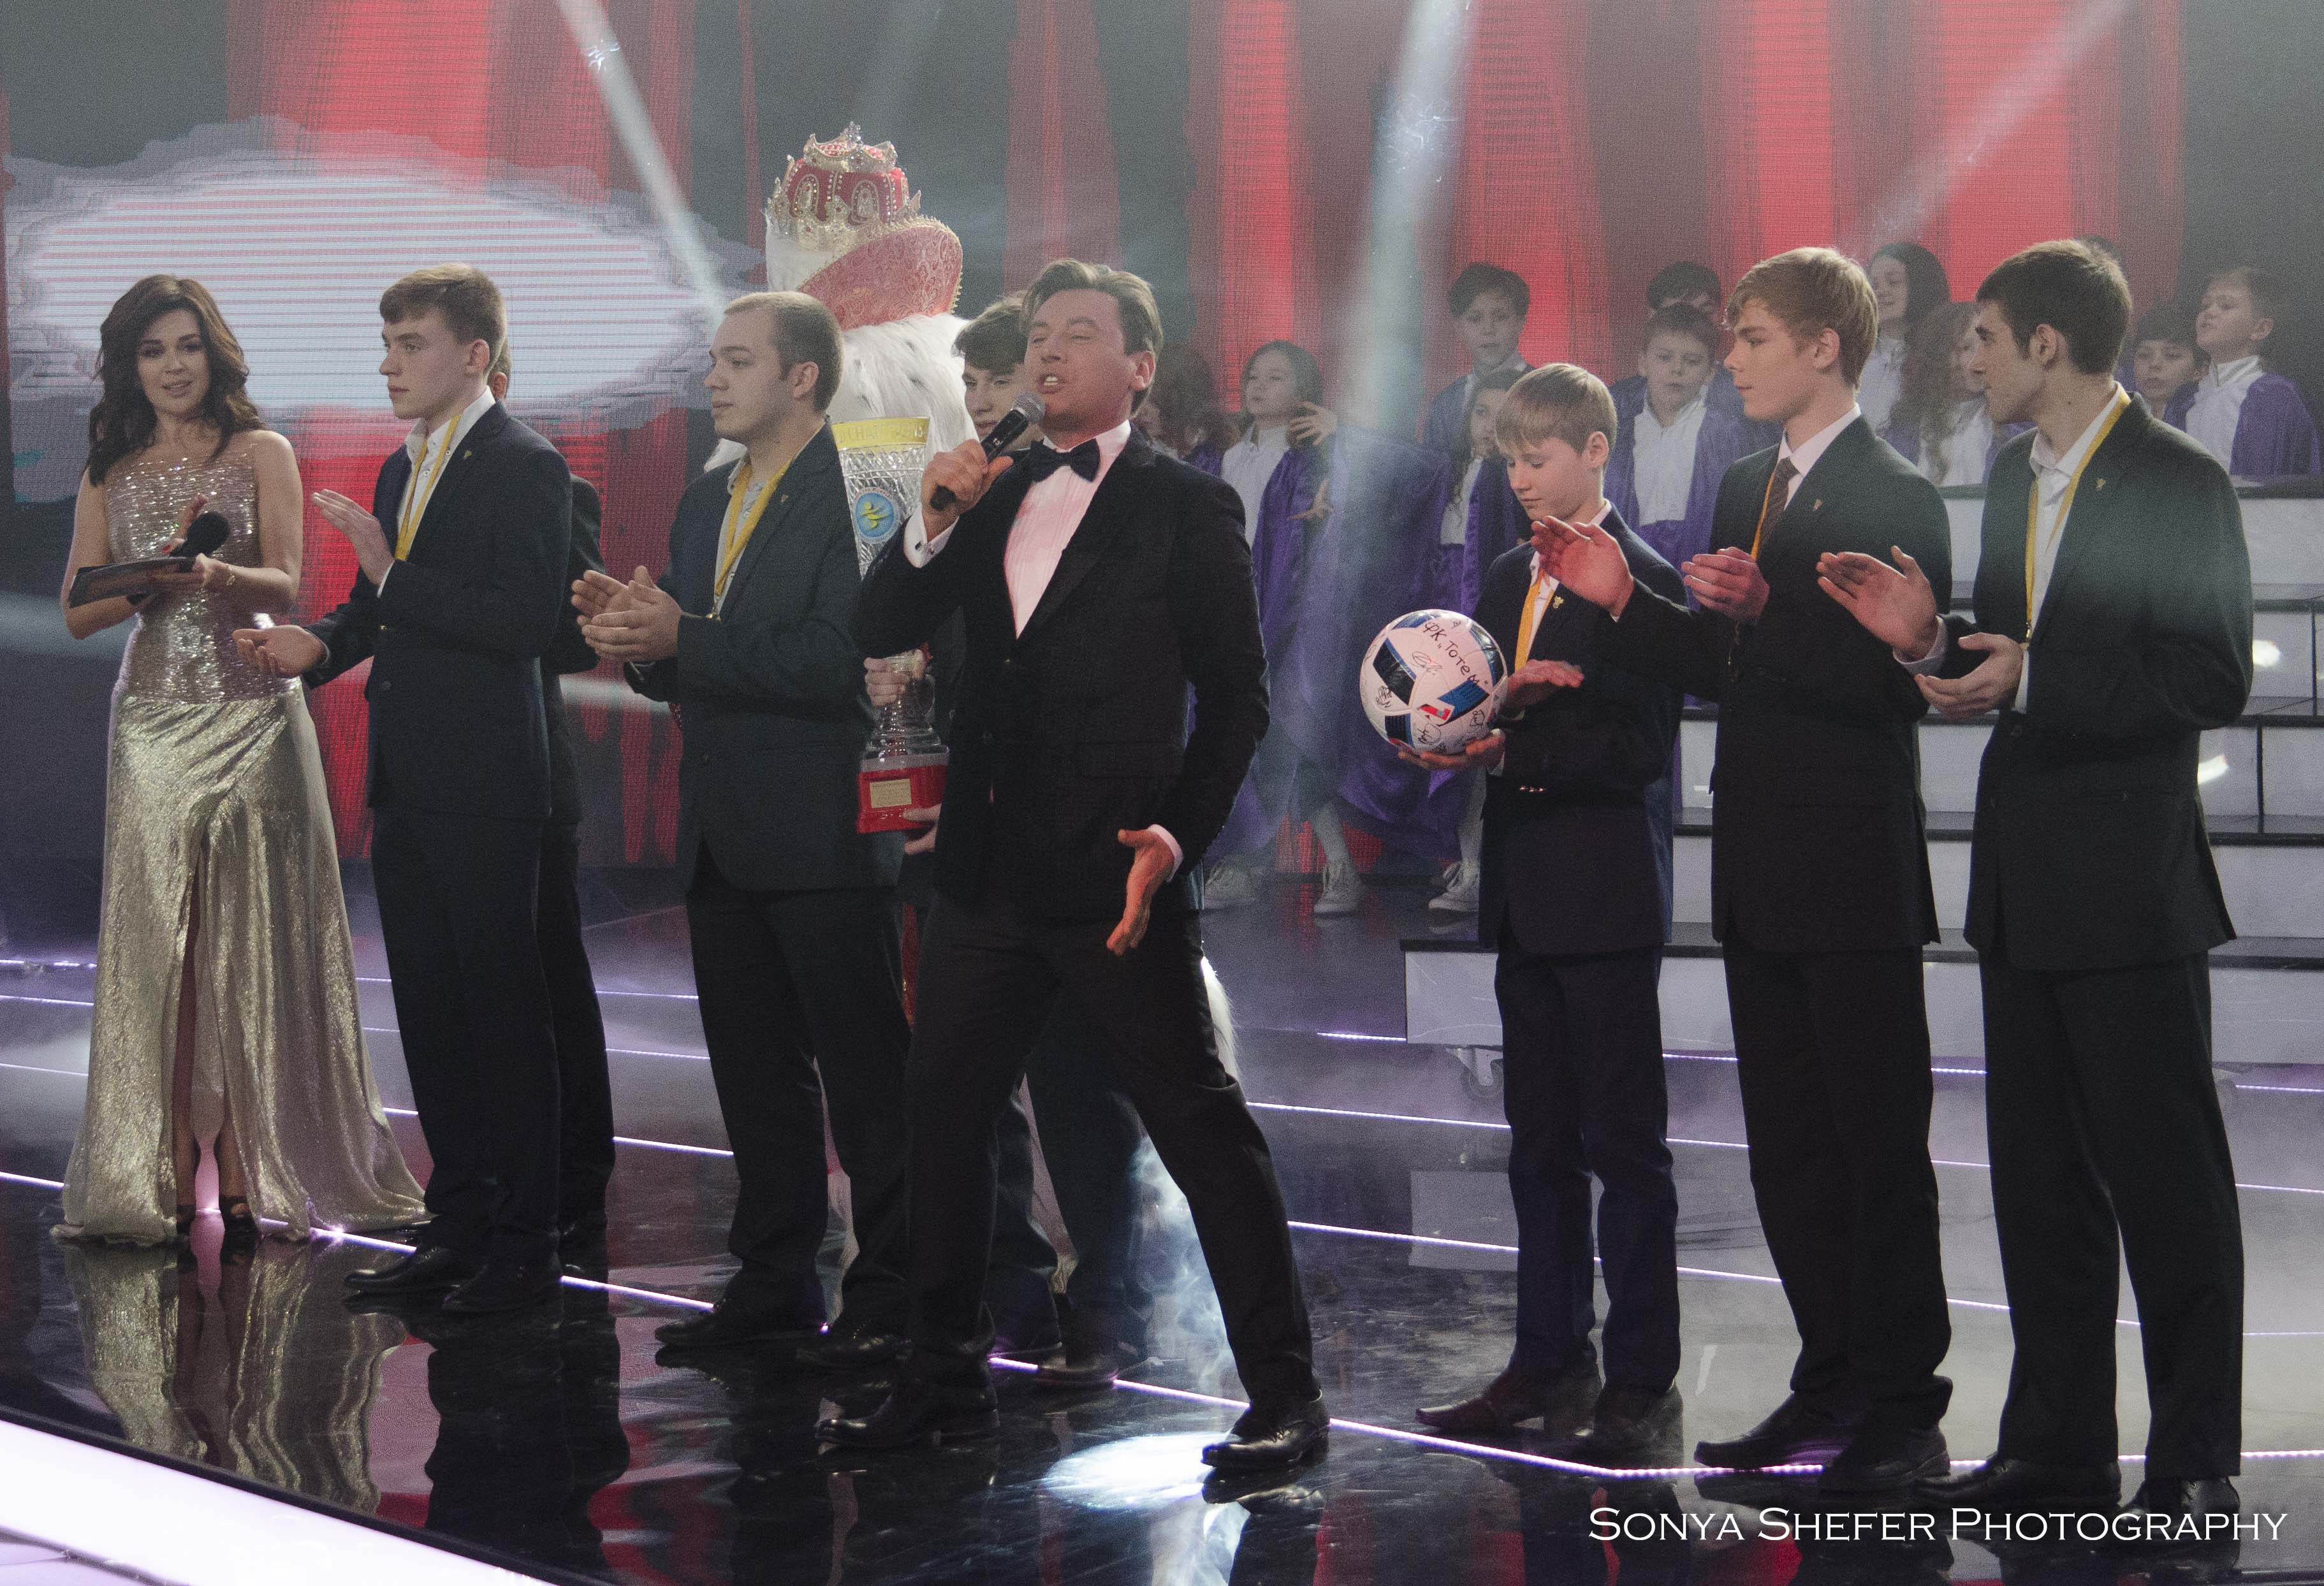 Ruslan-Concertn-31.12.2016 (16 of 16)